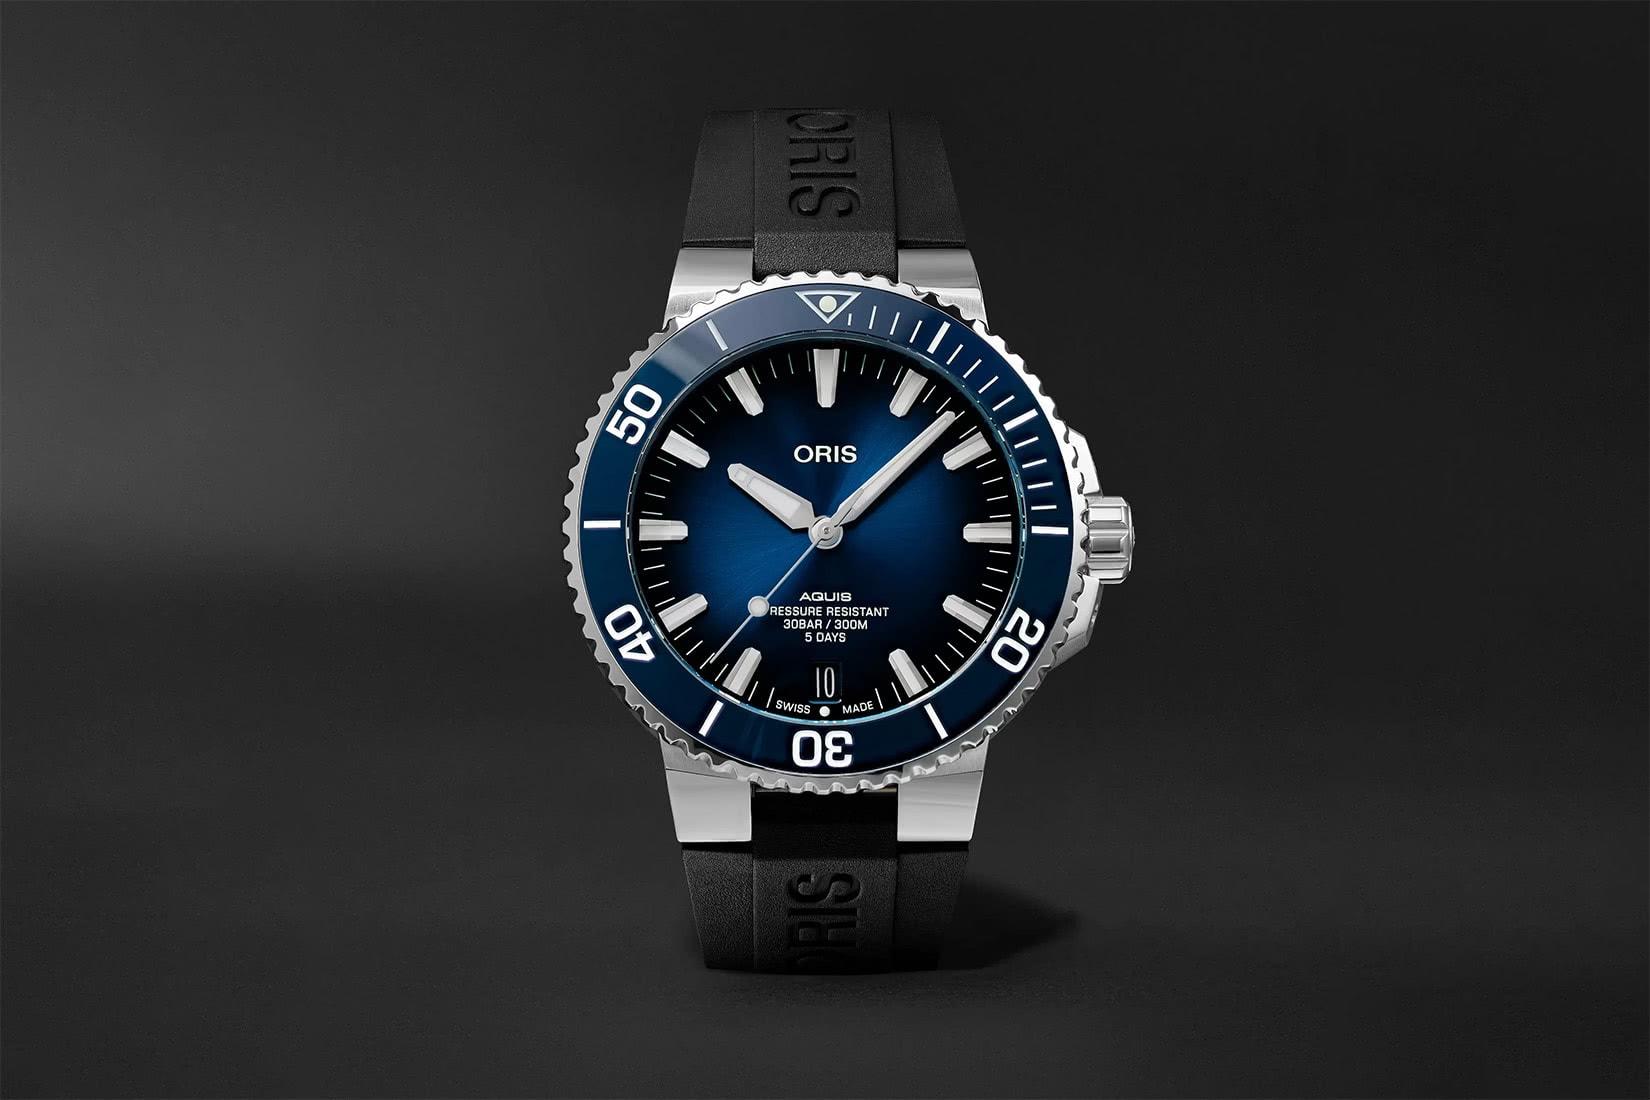 watch styles dive - Luxe Digital